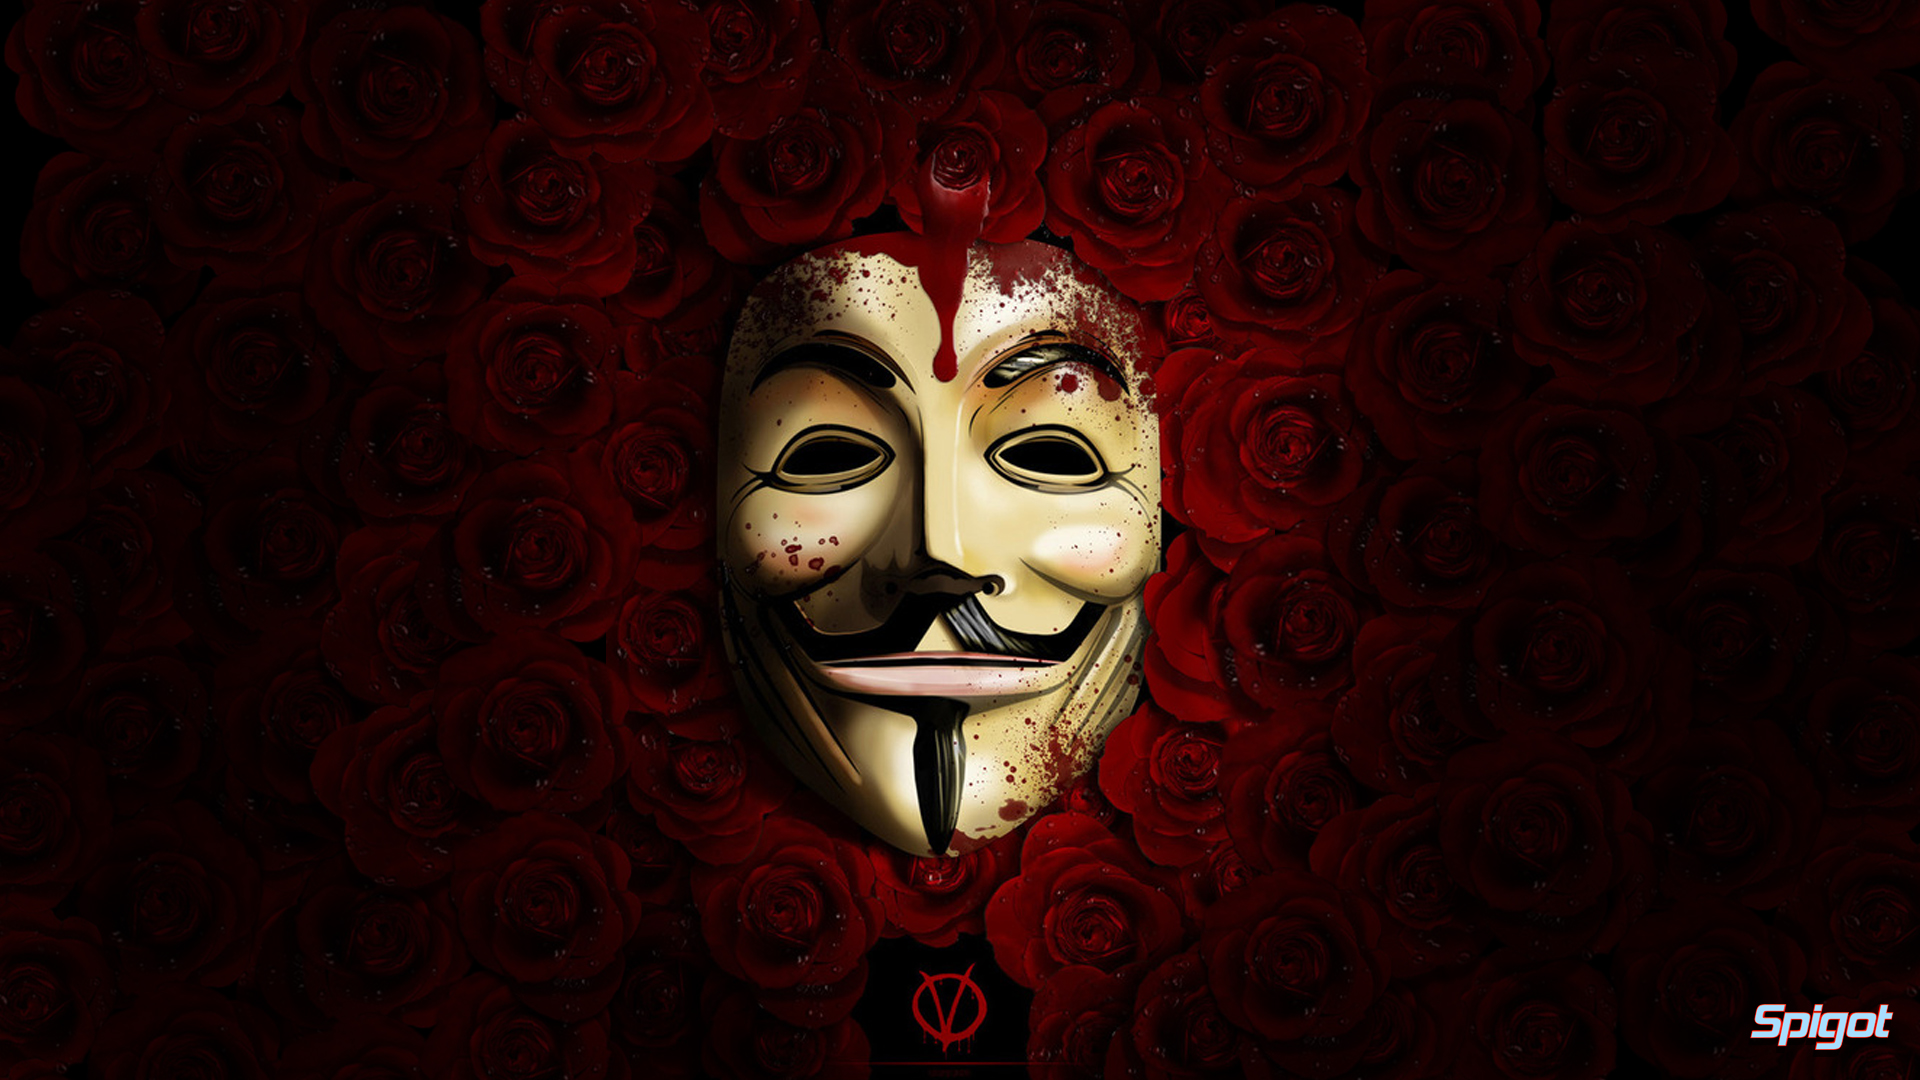 for Vendetta George Spigots Blog 1920x1080